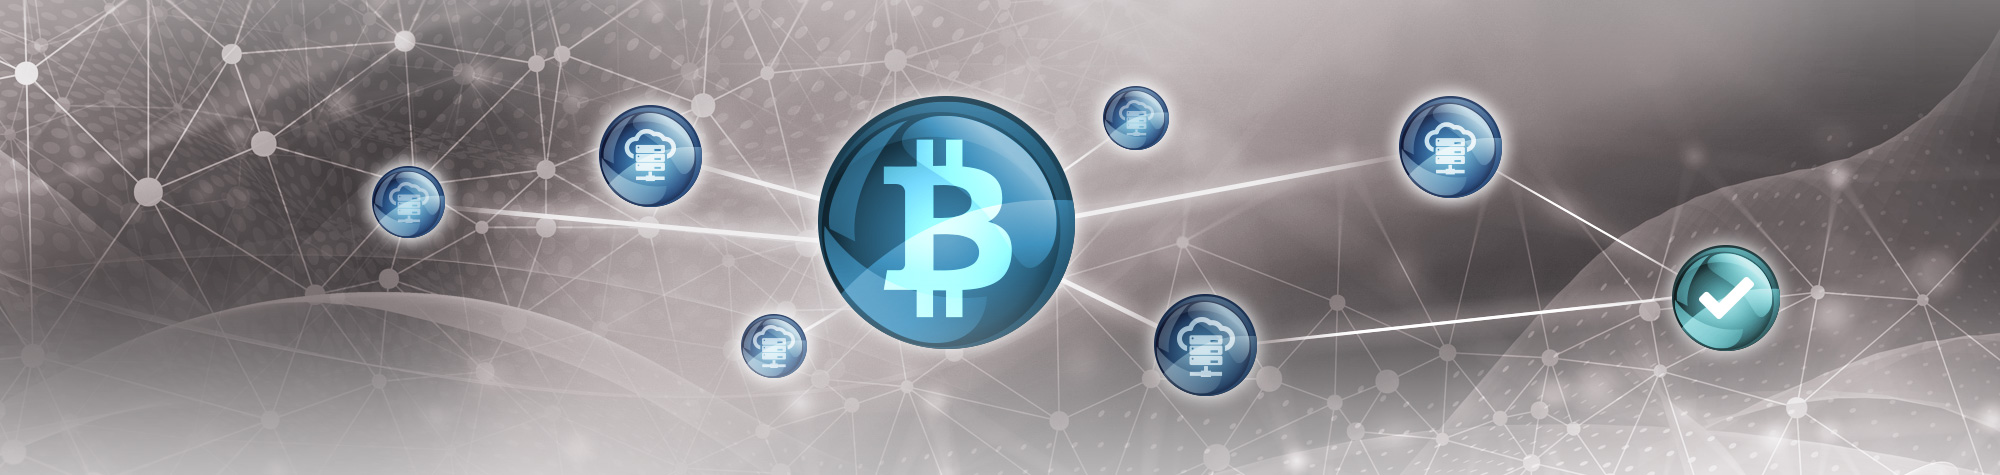 Empirica_blockchain_banner